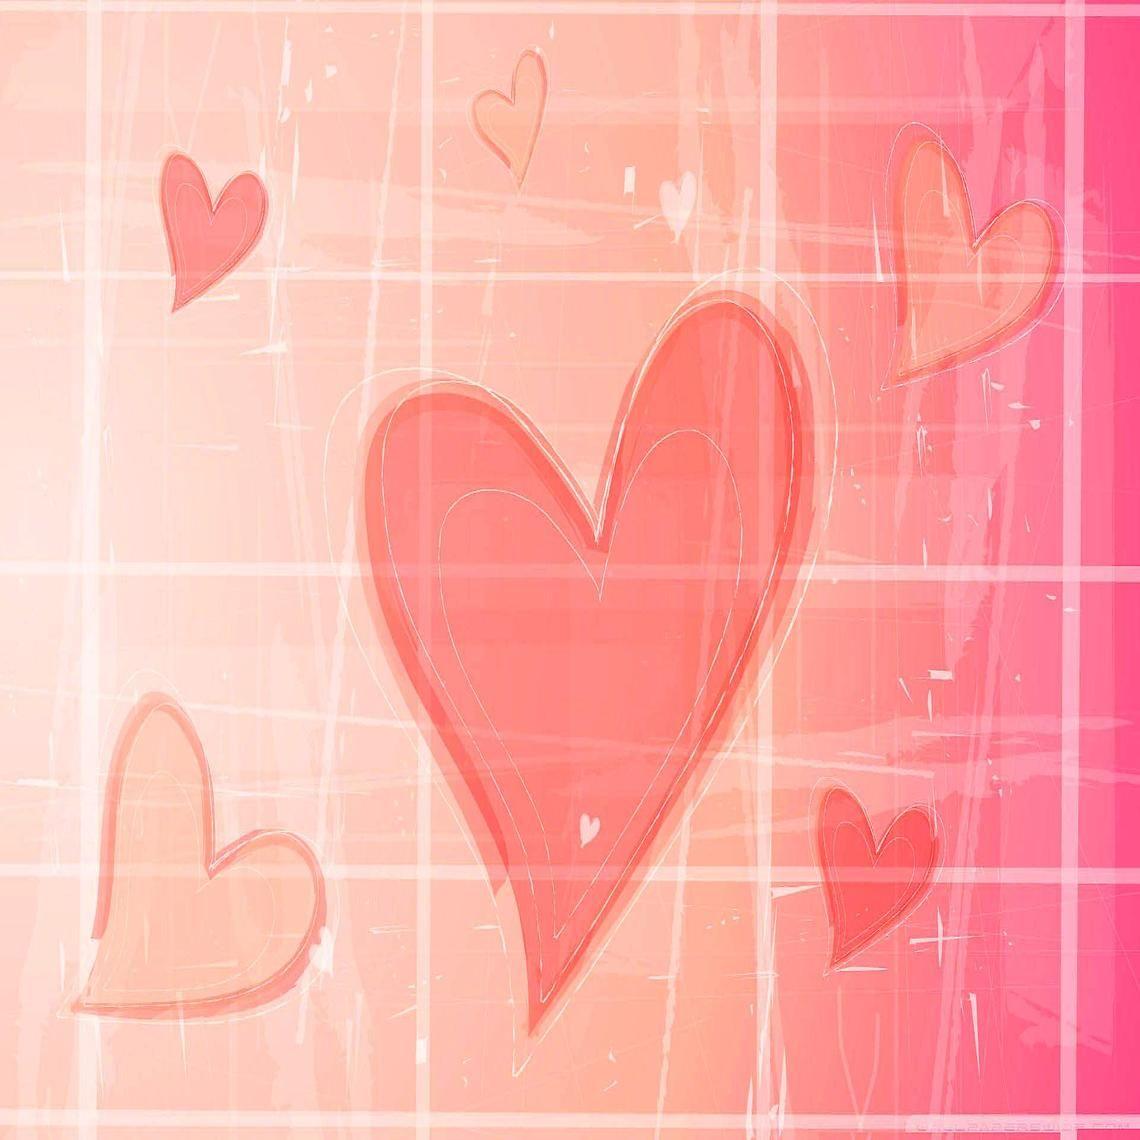 PINK HEARTS ART